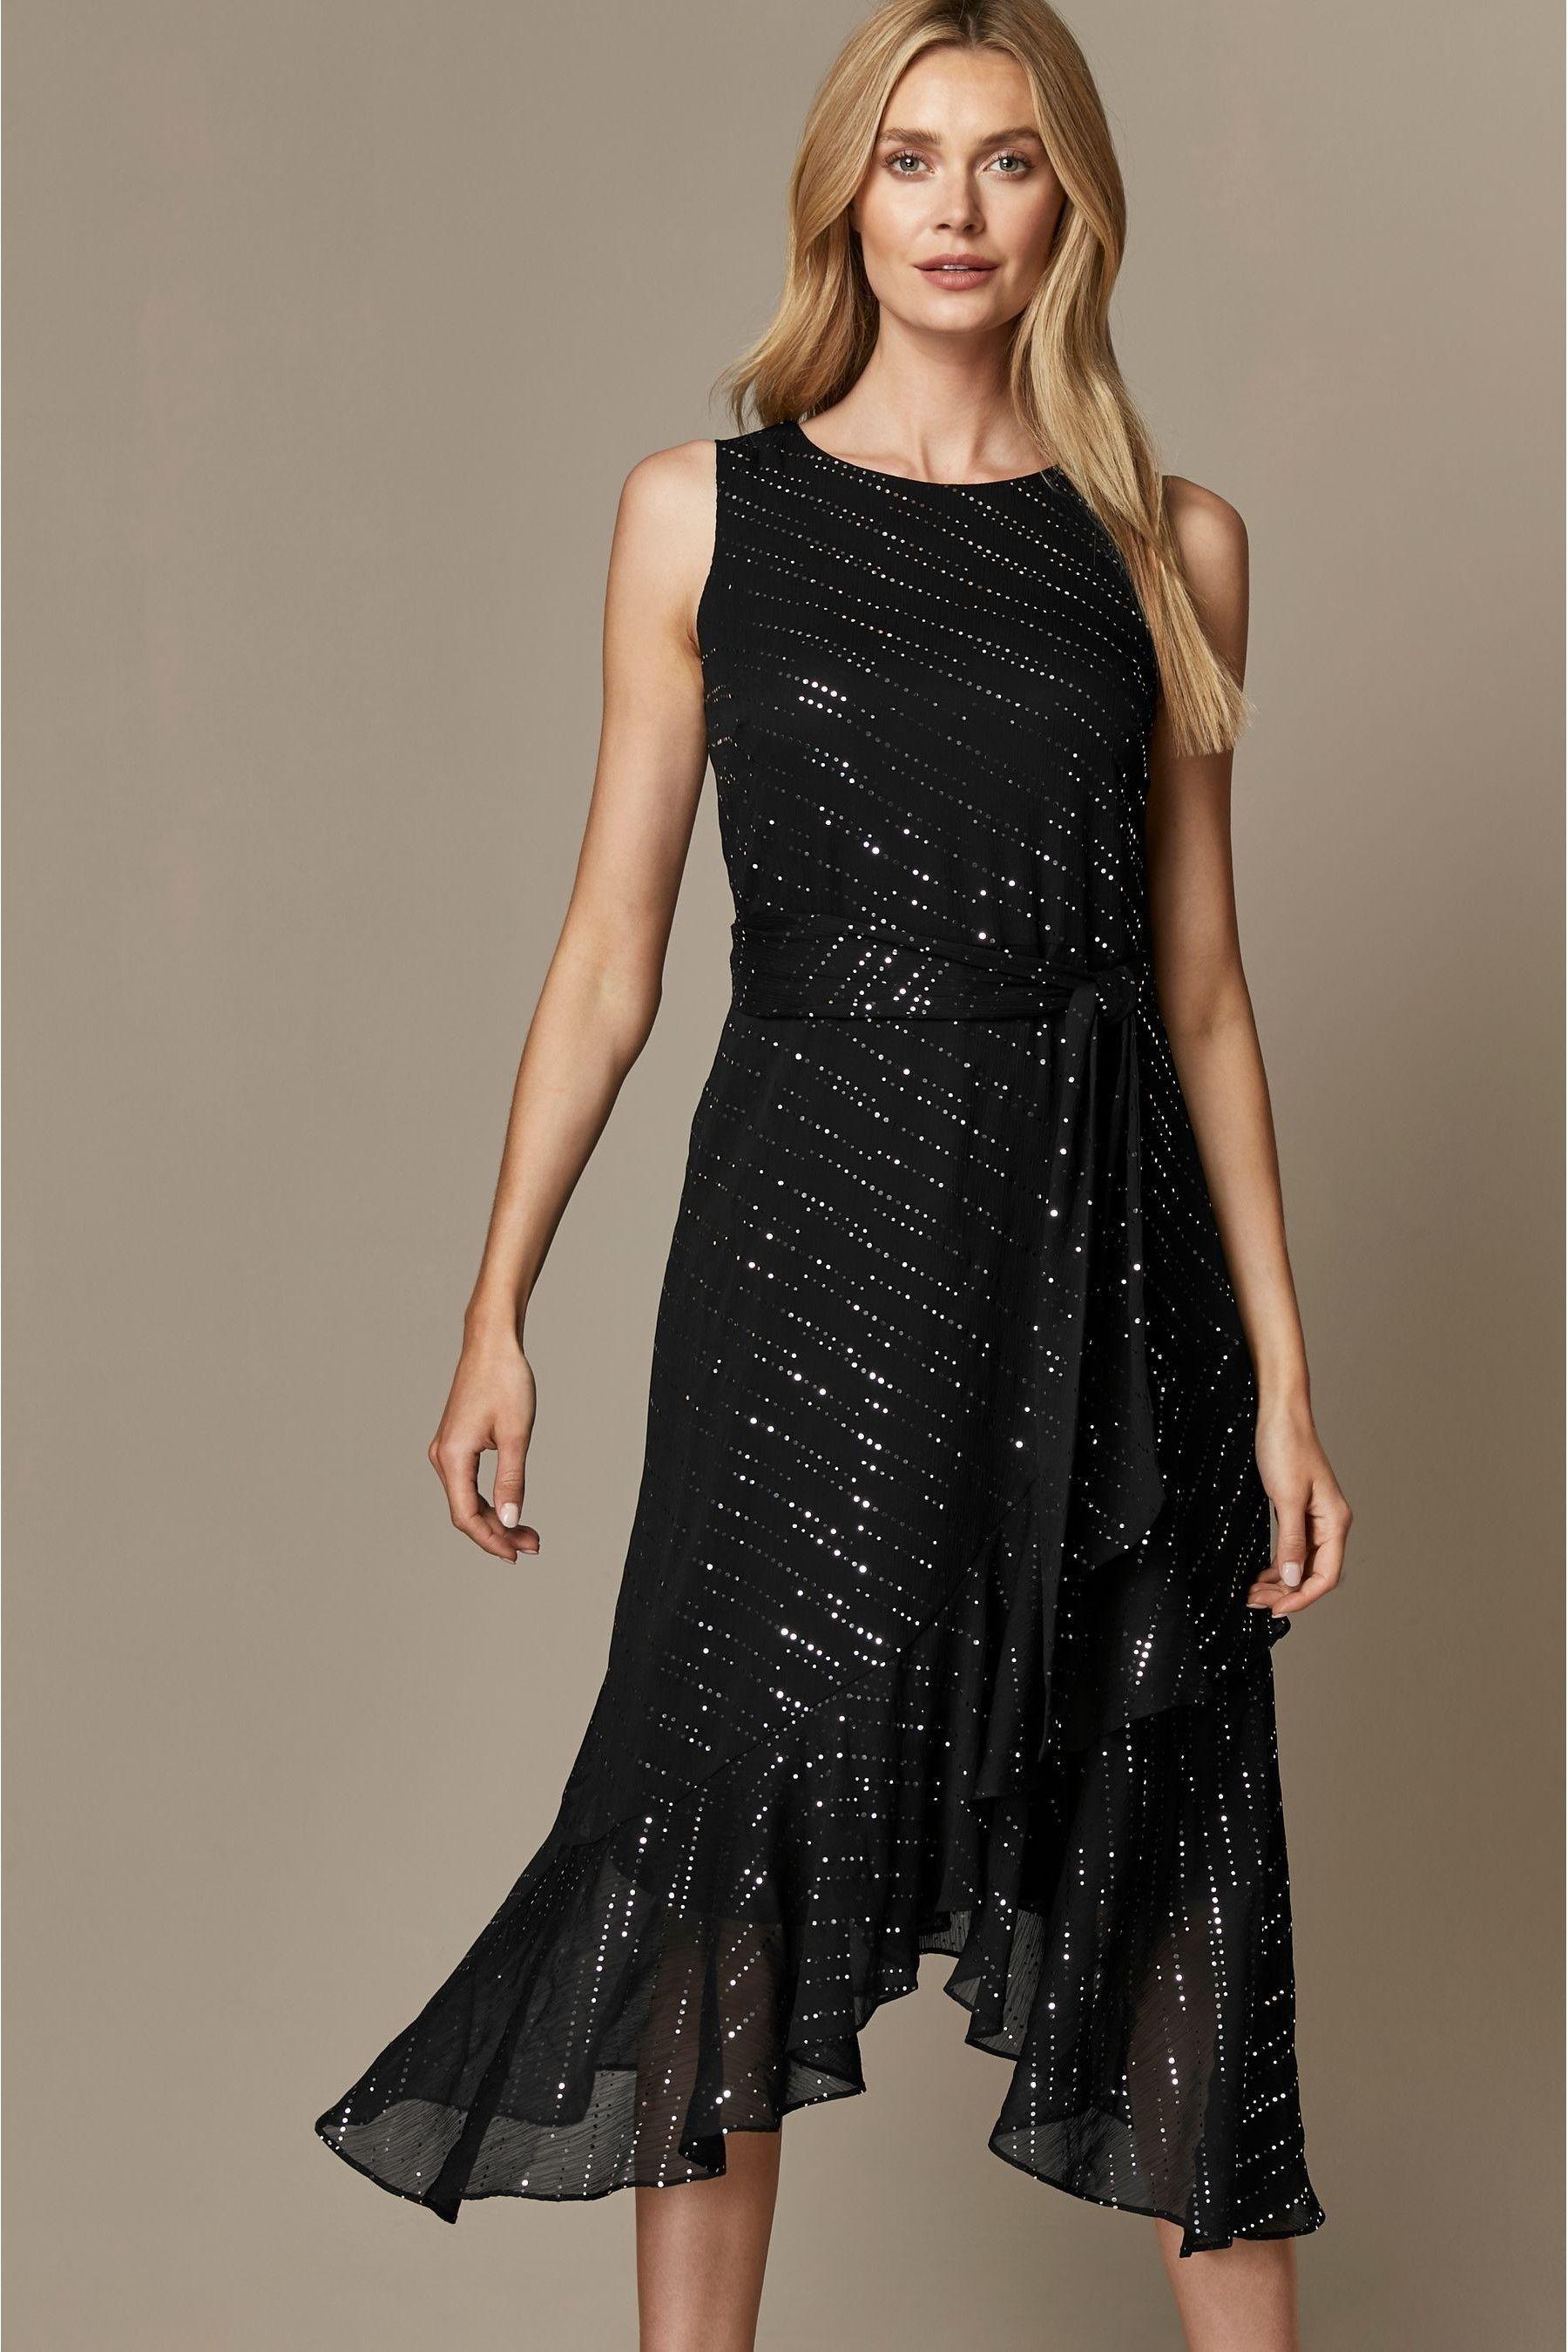 Womens Wallis Black Twinkle Midi Fit Flare Dress Black Black Sparkle Midi Dress Fit Flare Dress Dresses